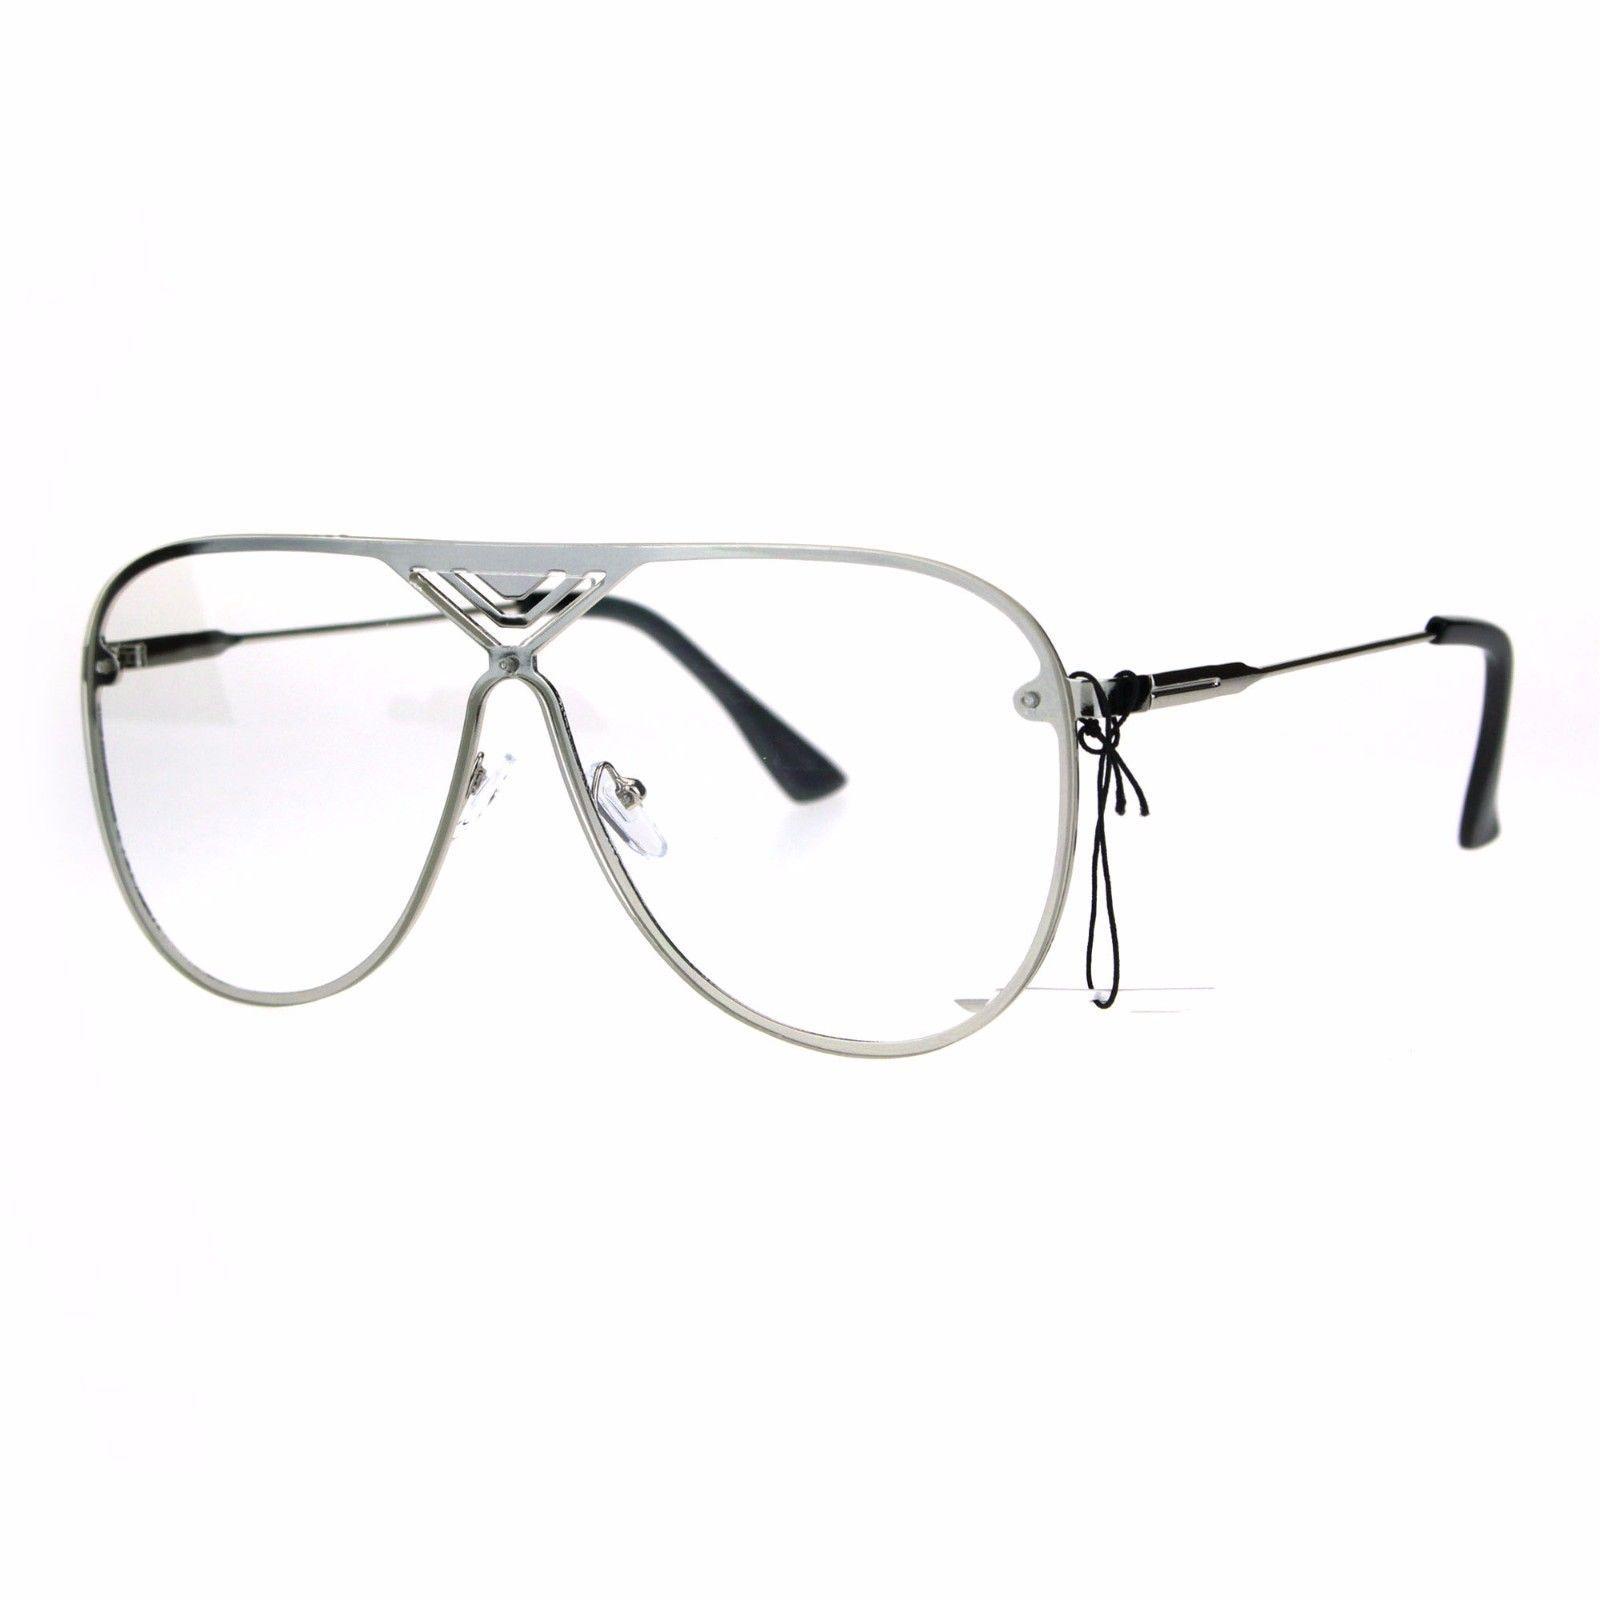 Oversized Clear Lens Glasses Flat Top Racer Aviator Fashion Eyeglasses